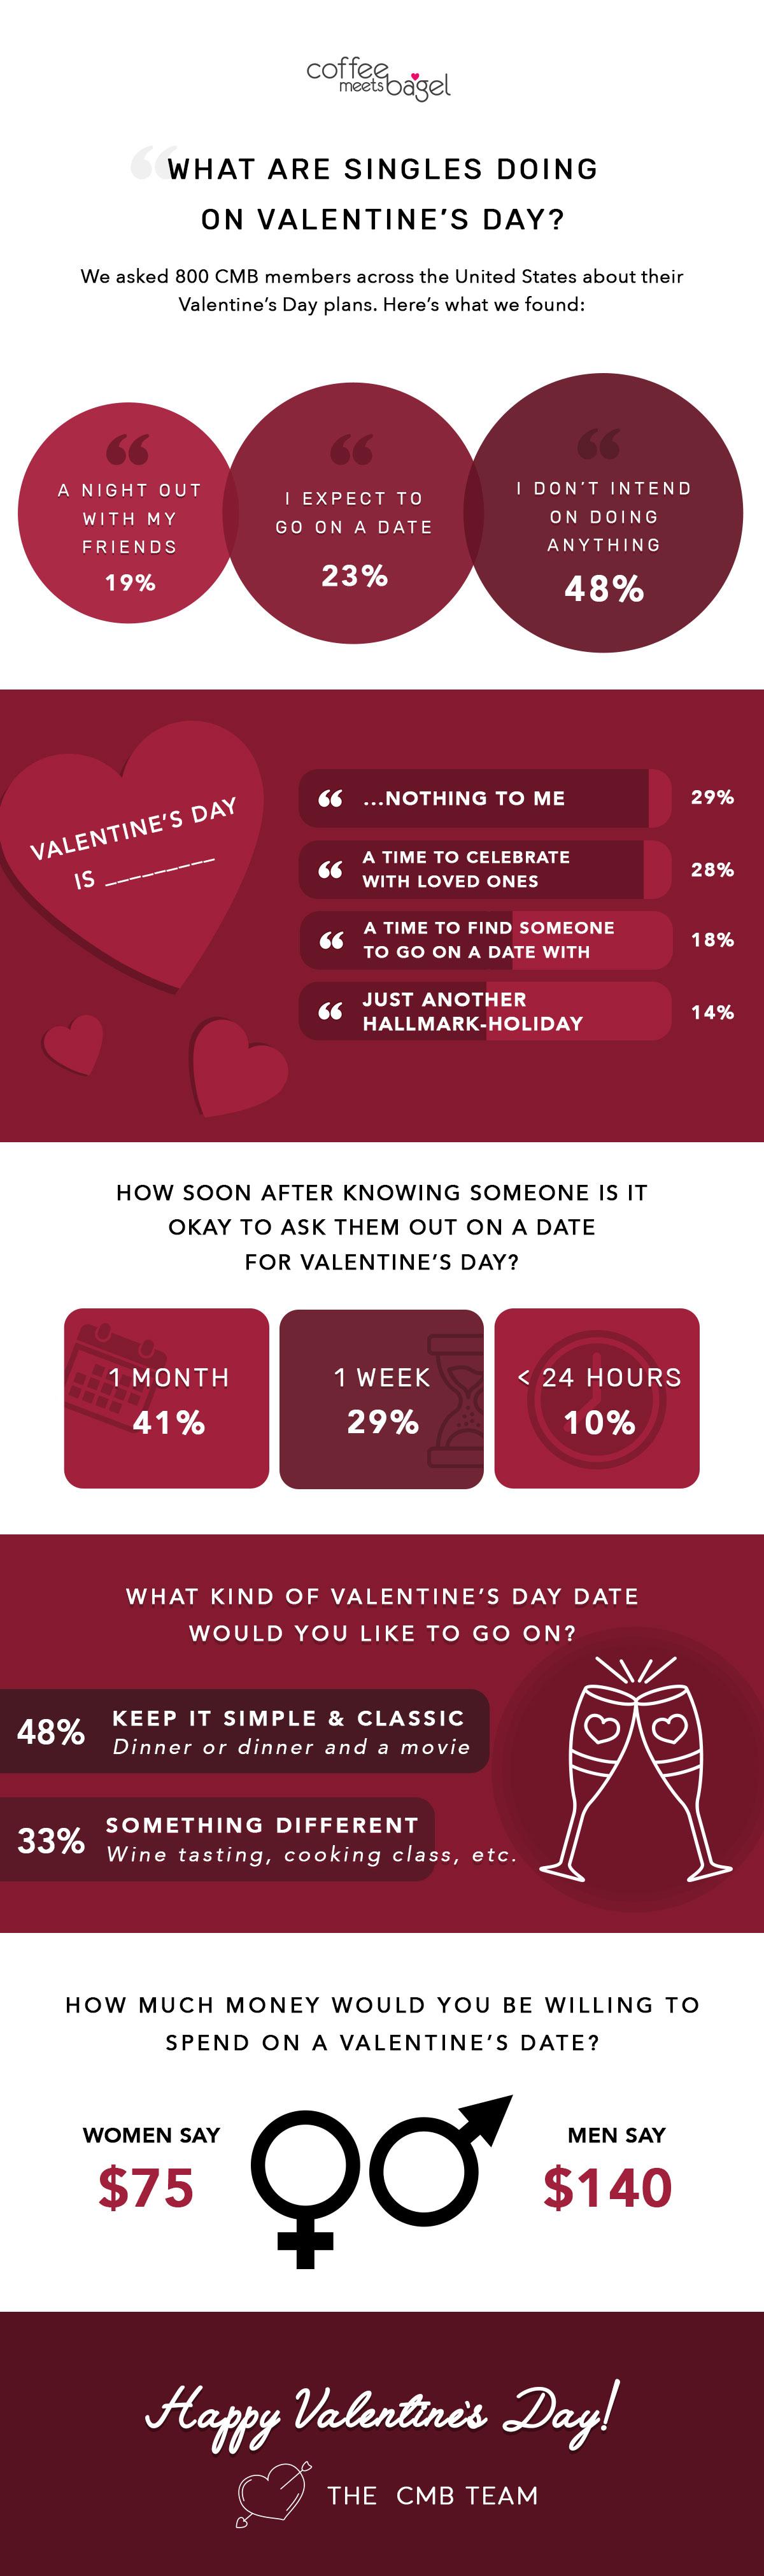 dating over 60 men